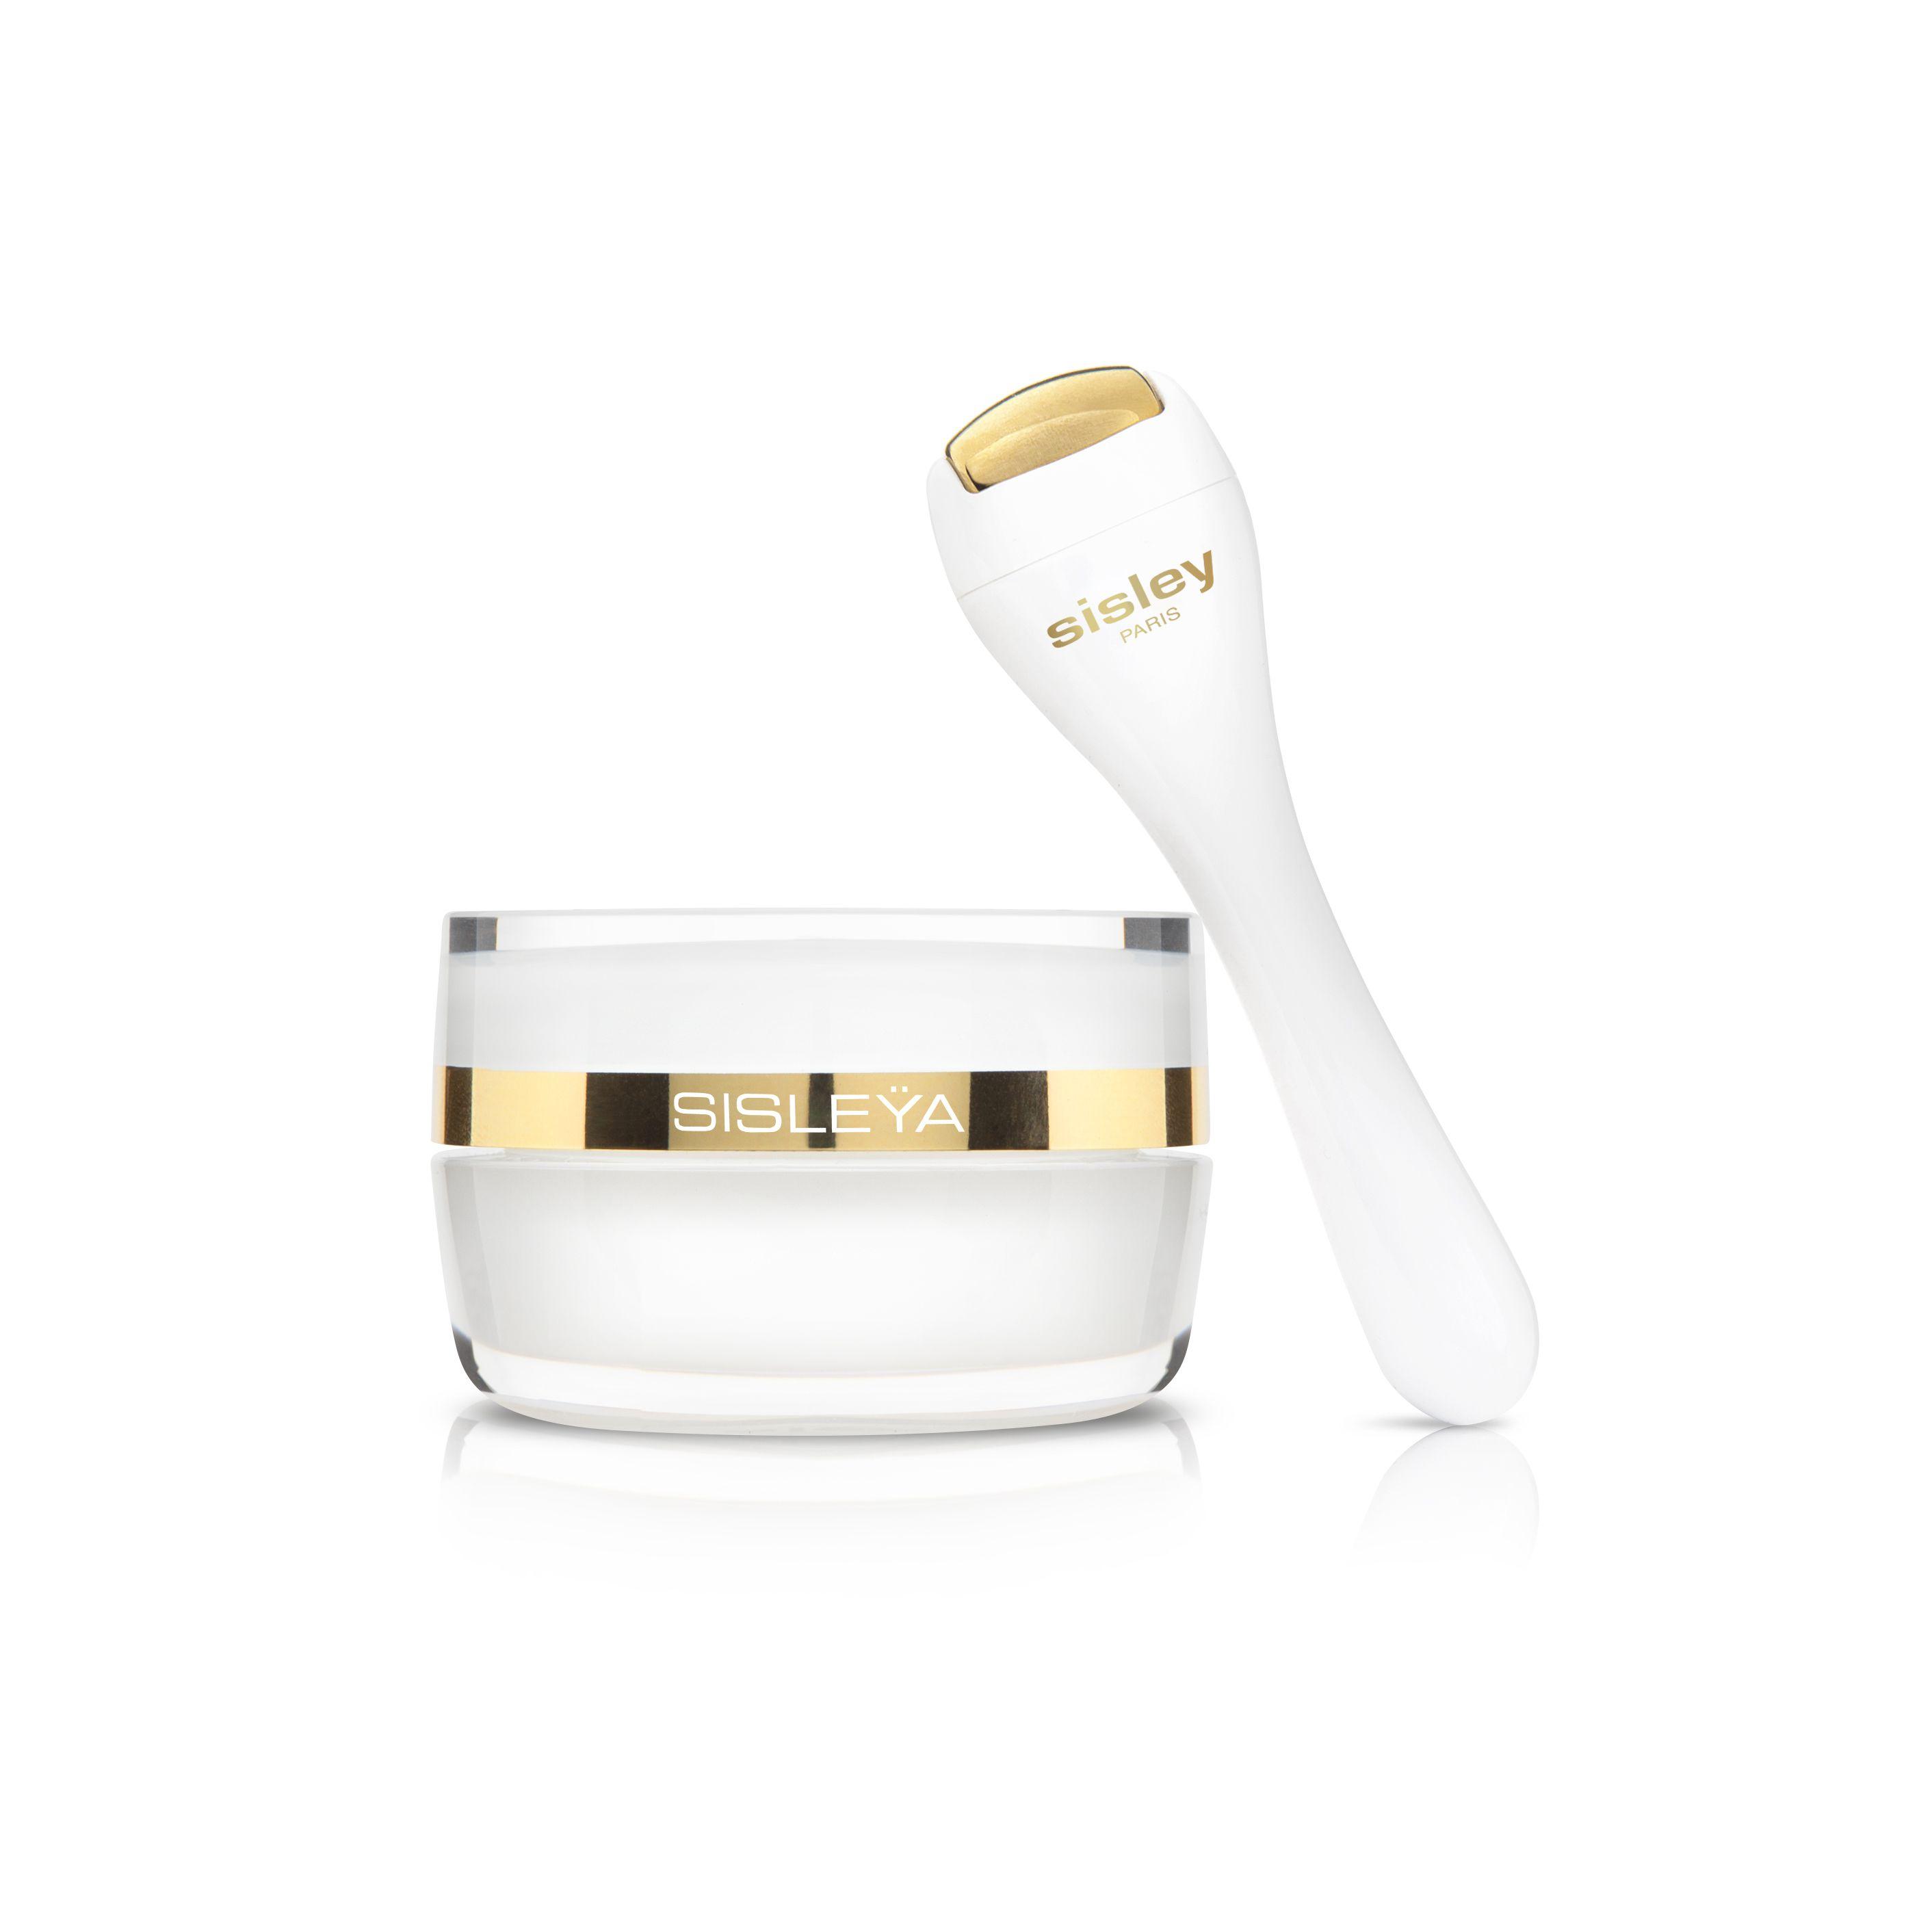 Sisleÿa L'Intégral Anti-Age Eye & Lip Contour Cream & Massage Tool